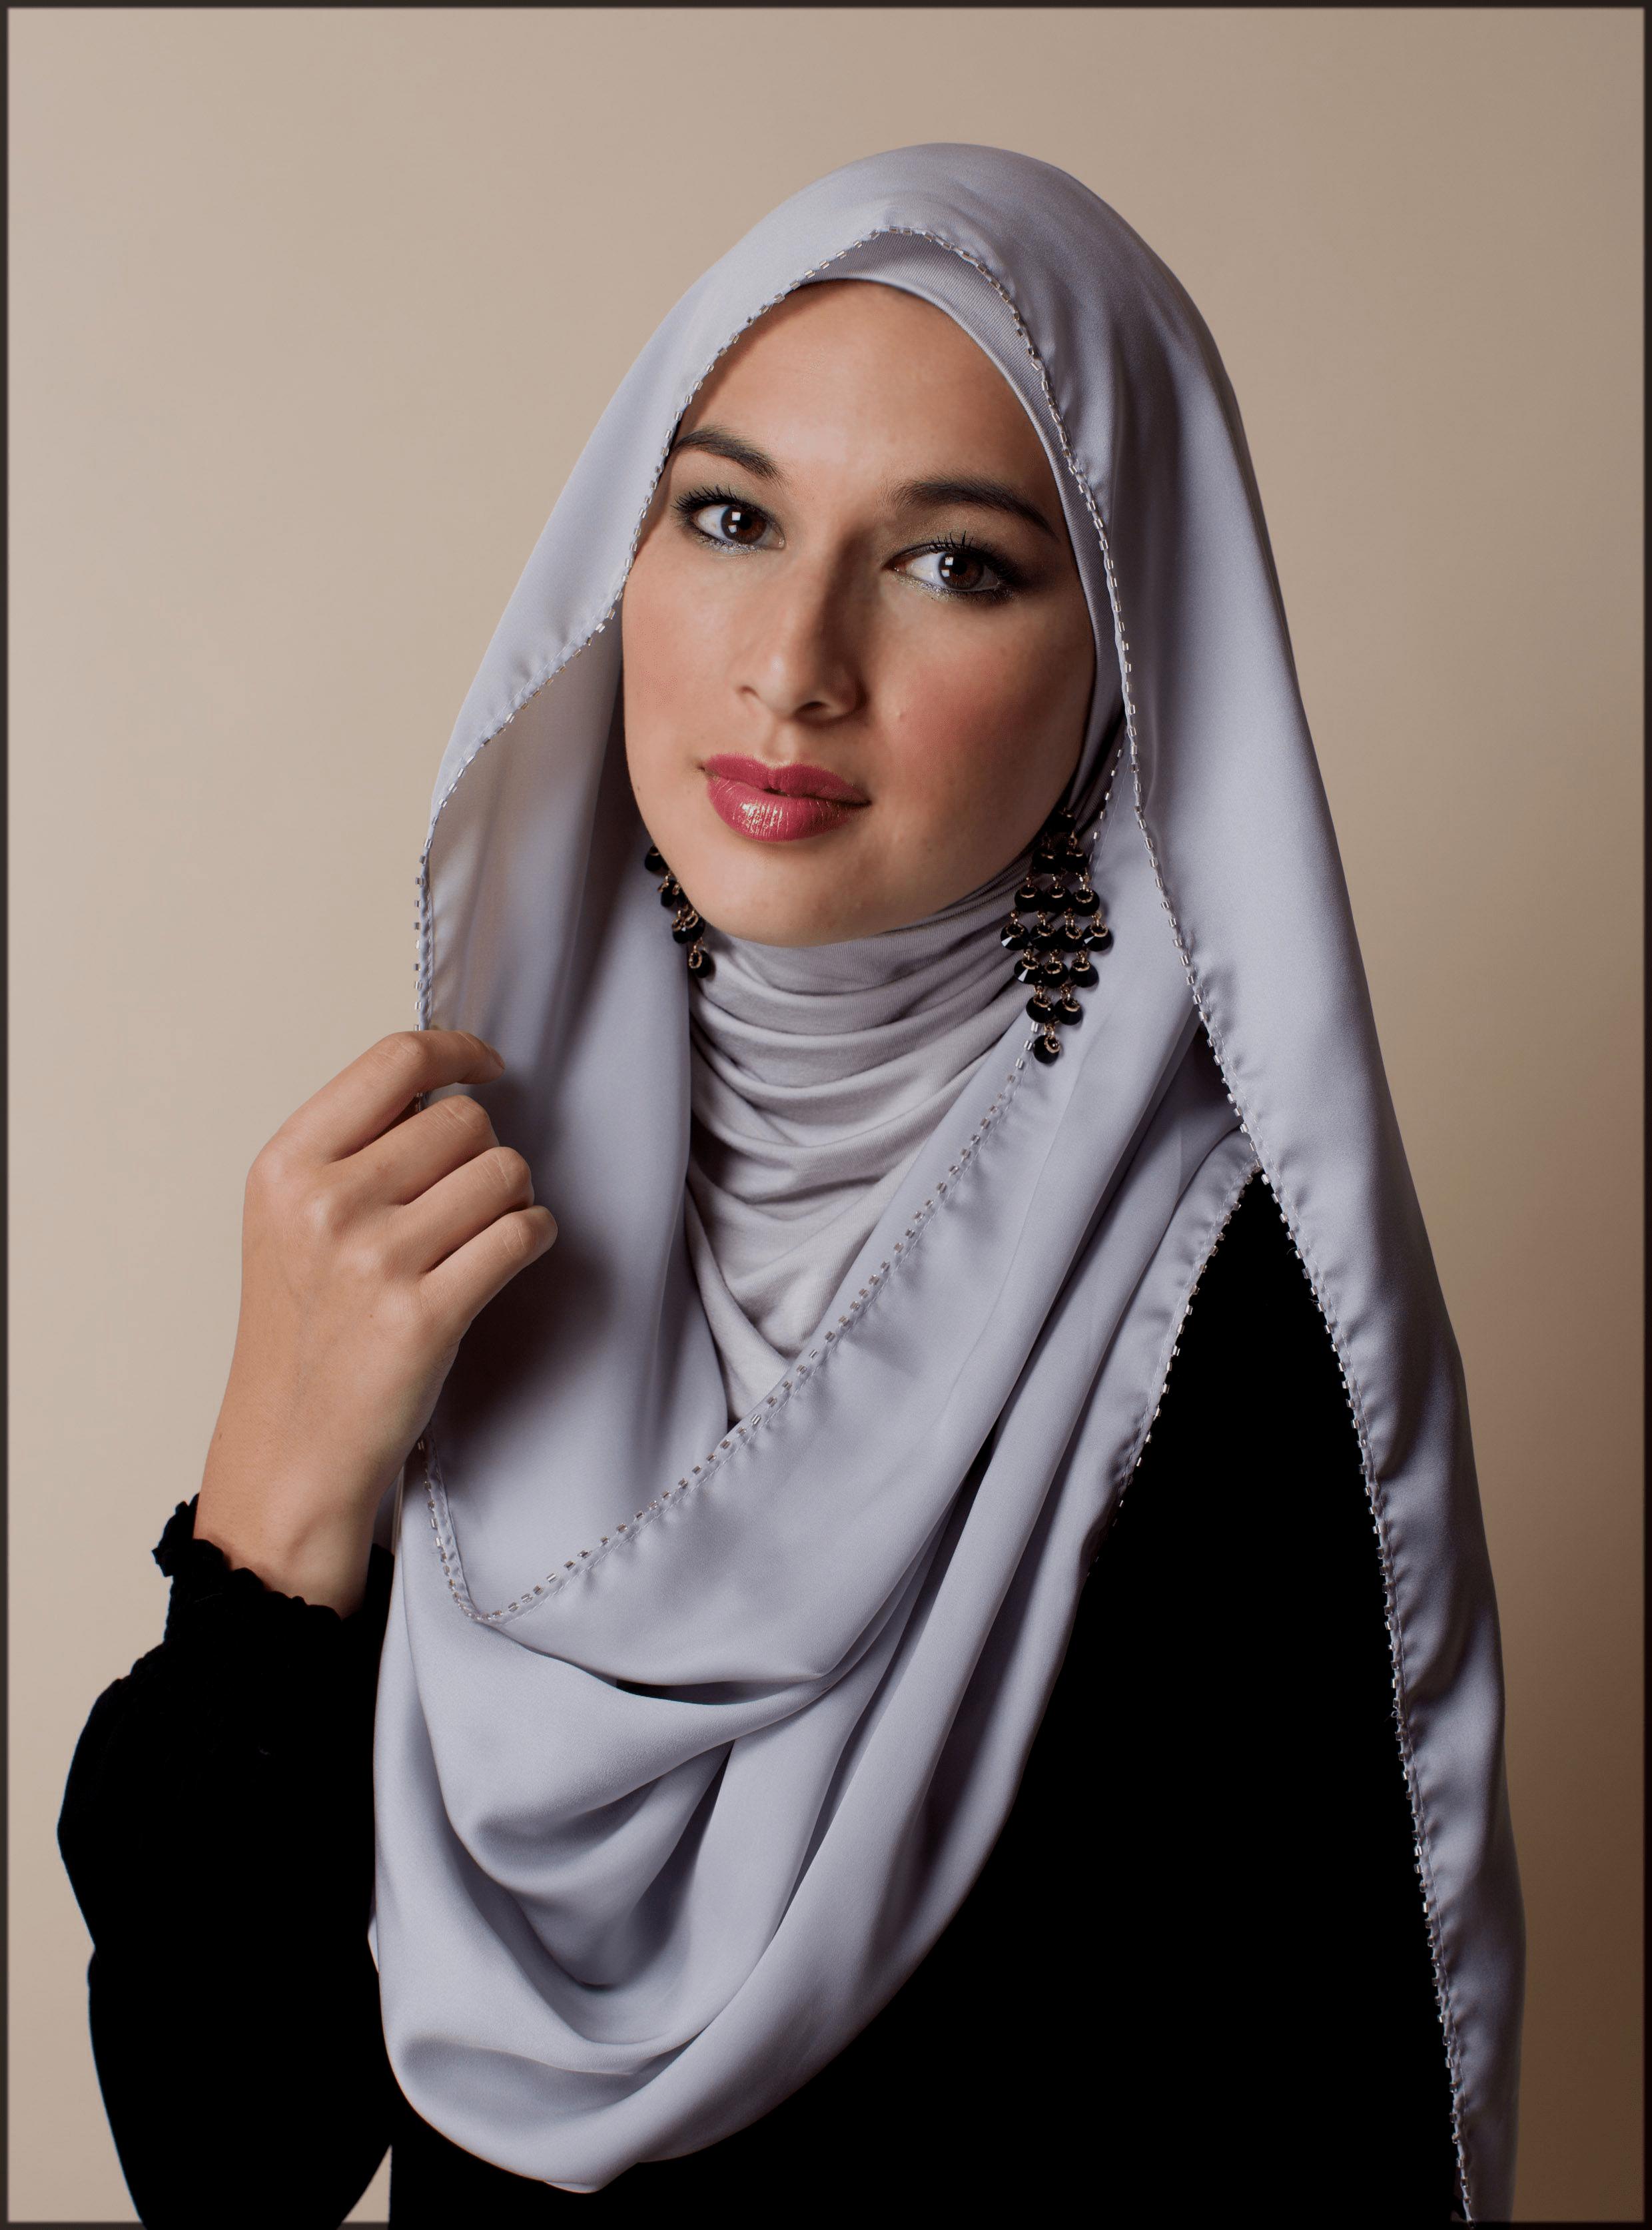 stylish turkish hijjab style showing earrings